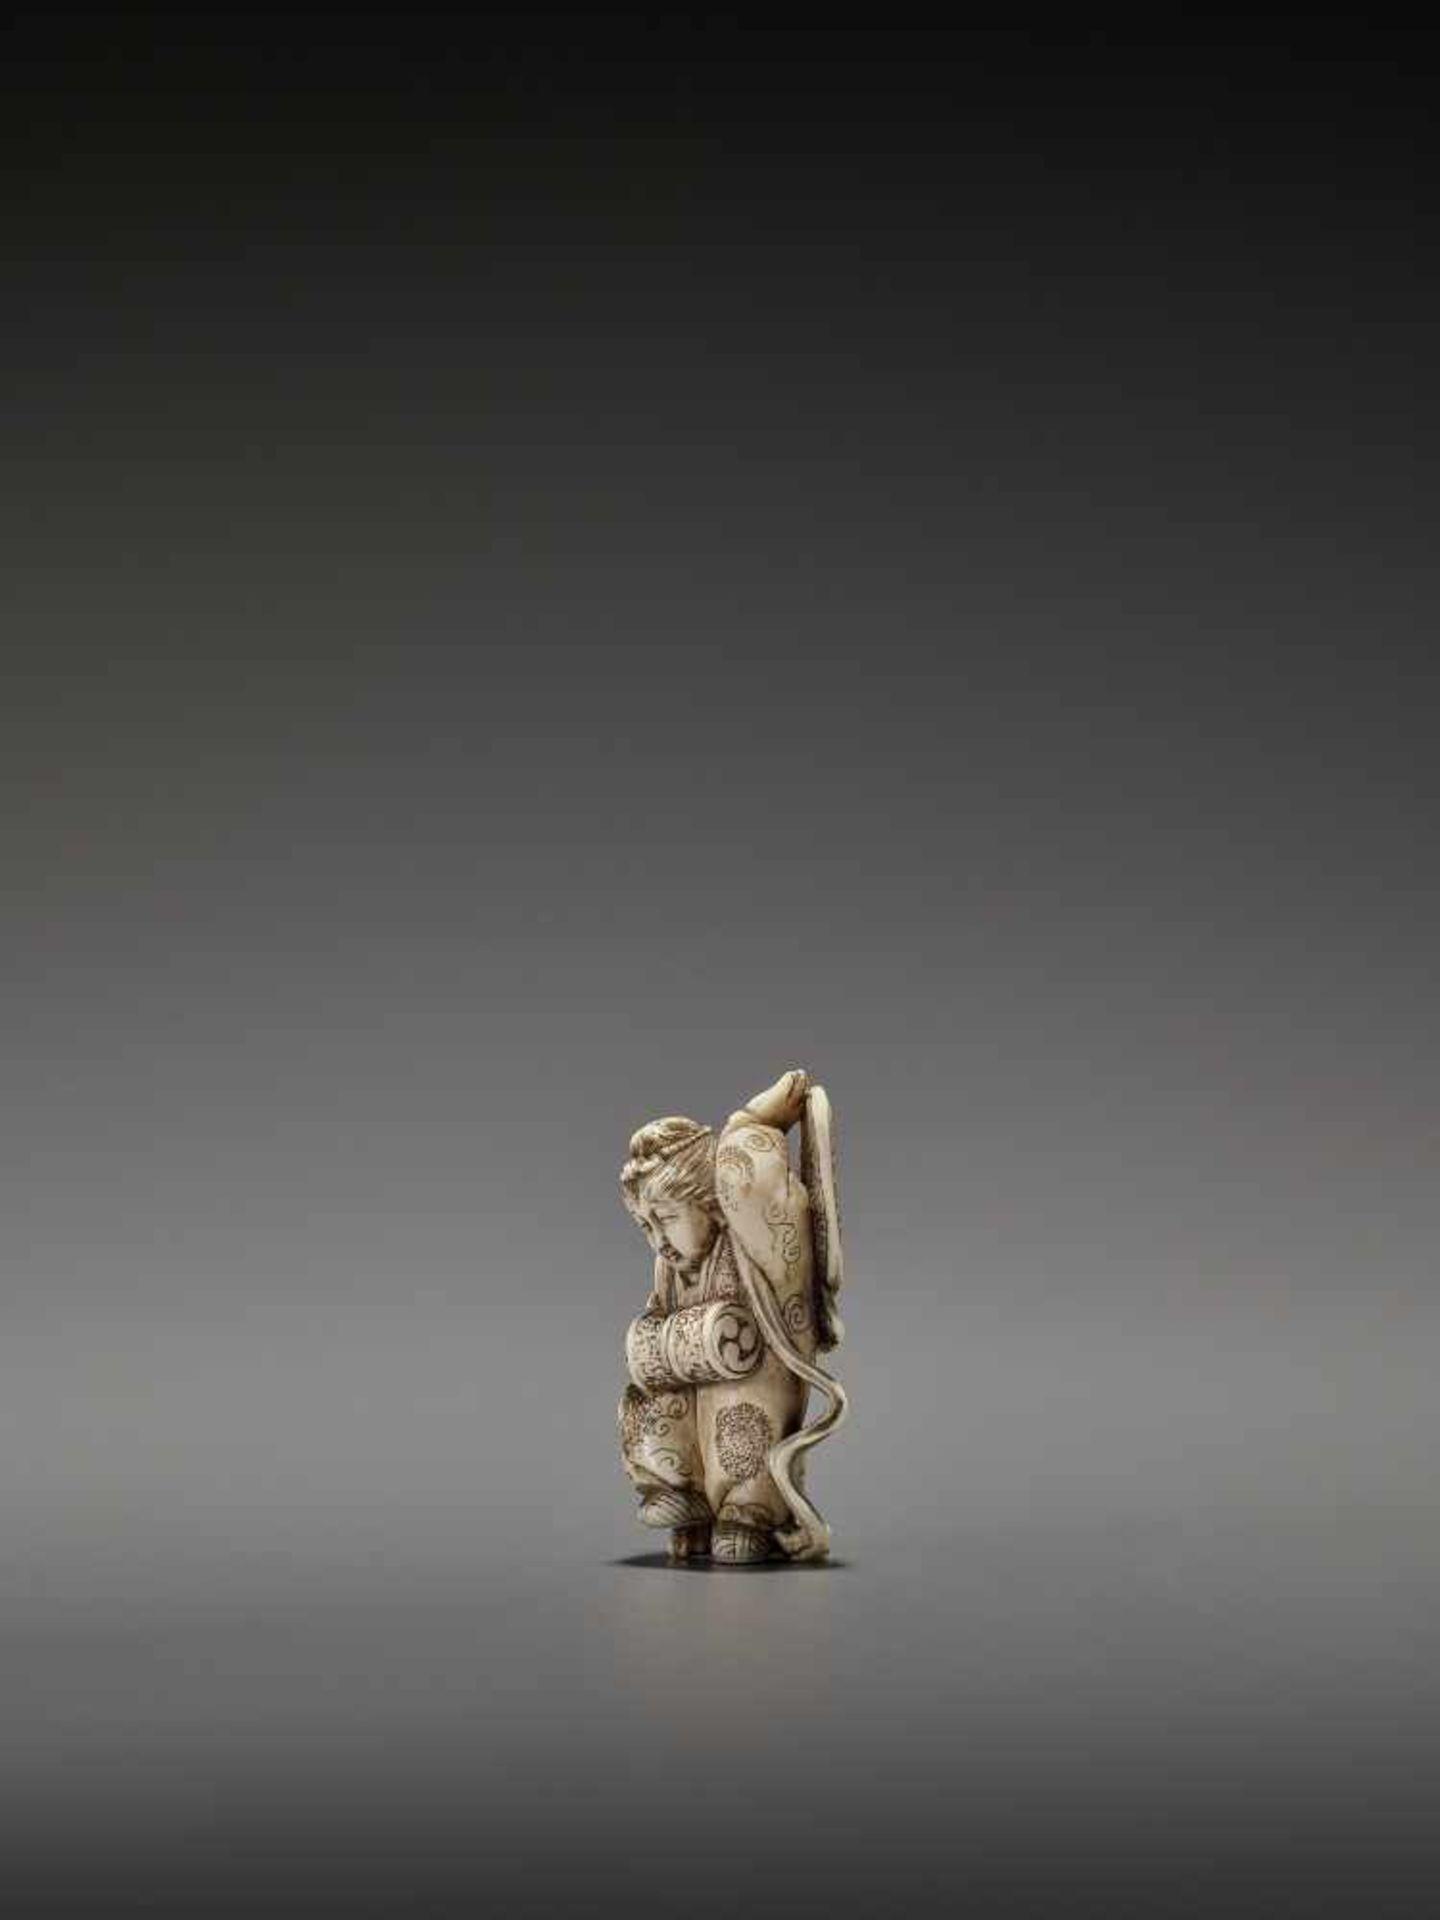 MASAHIRO: A VERY RARE IVORY NETSUKE OF A BUTTERFLY DANCER, KOCHO NO MAI By Masahiro, signed - Image 5 of 13